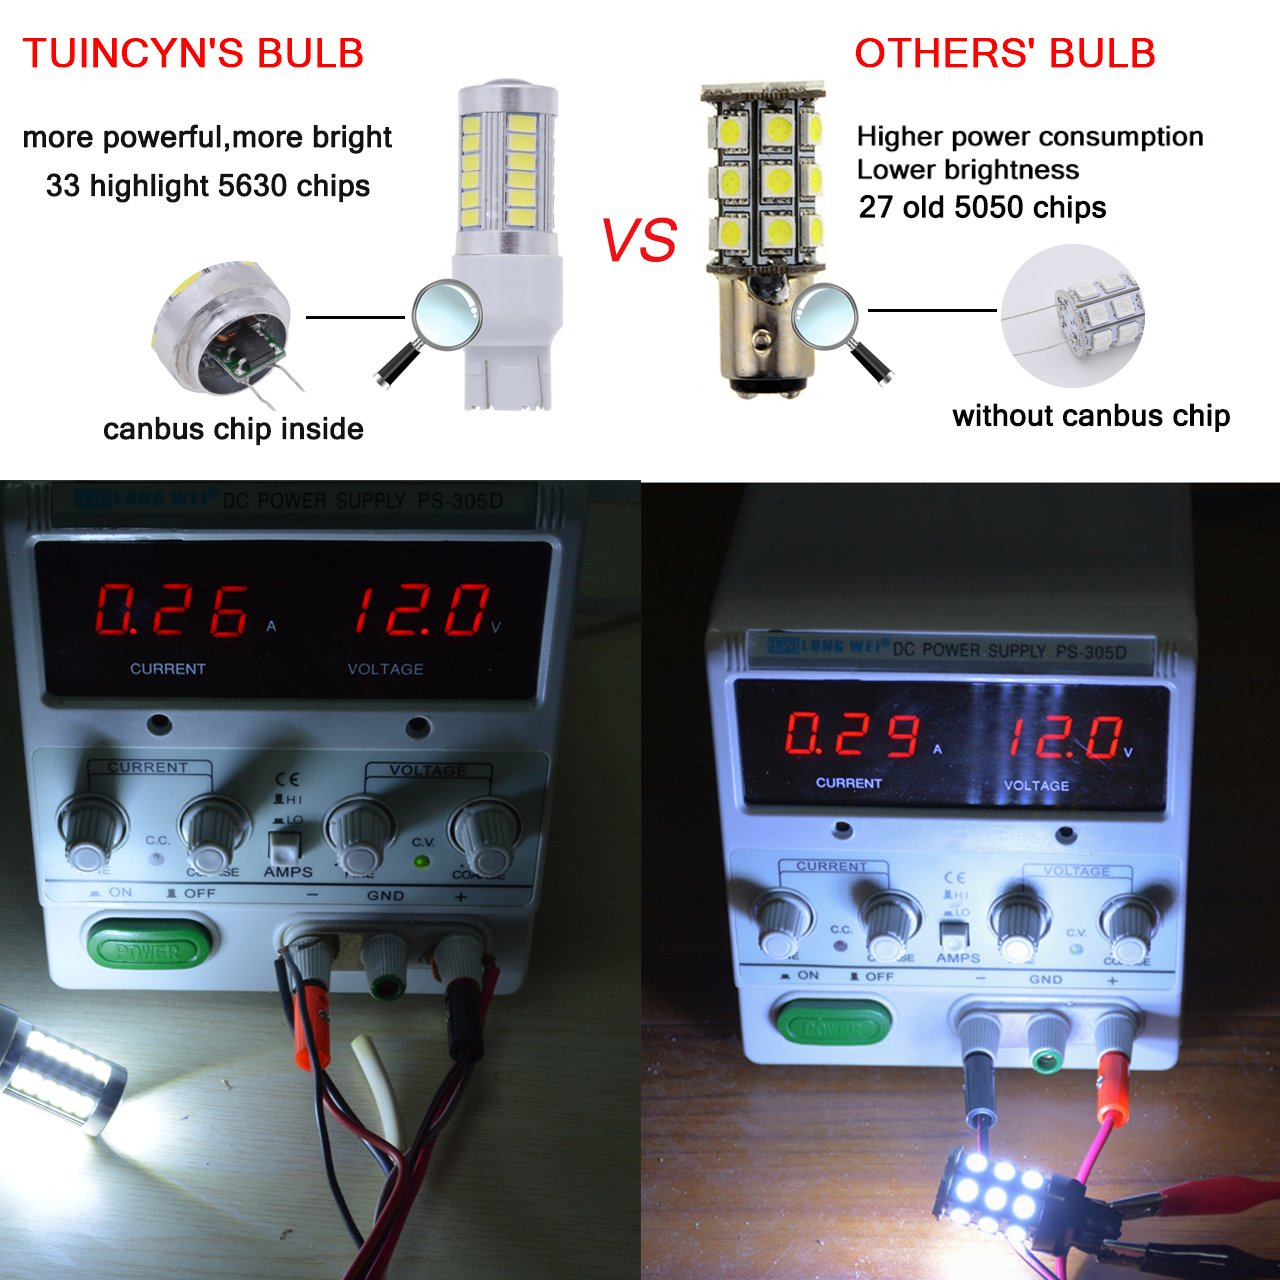 Pack of 2 TUINCYN 7443 W21W T20 992 7440 7444NA LED Brake Light Bulbs Red 5630 33SMD 900 Lumens Super Bright Back Up Reverse Light Turn Signals Light Tail Light Parking Light DRL DC 12V